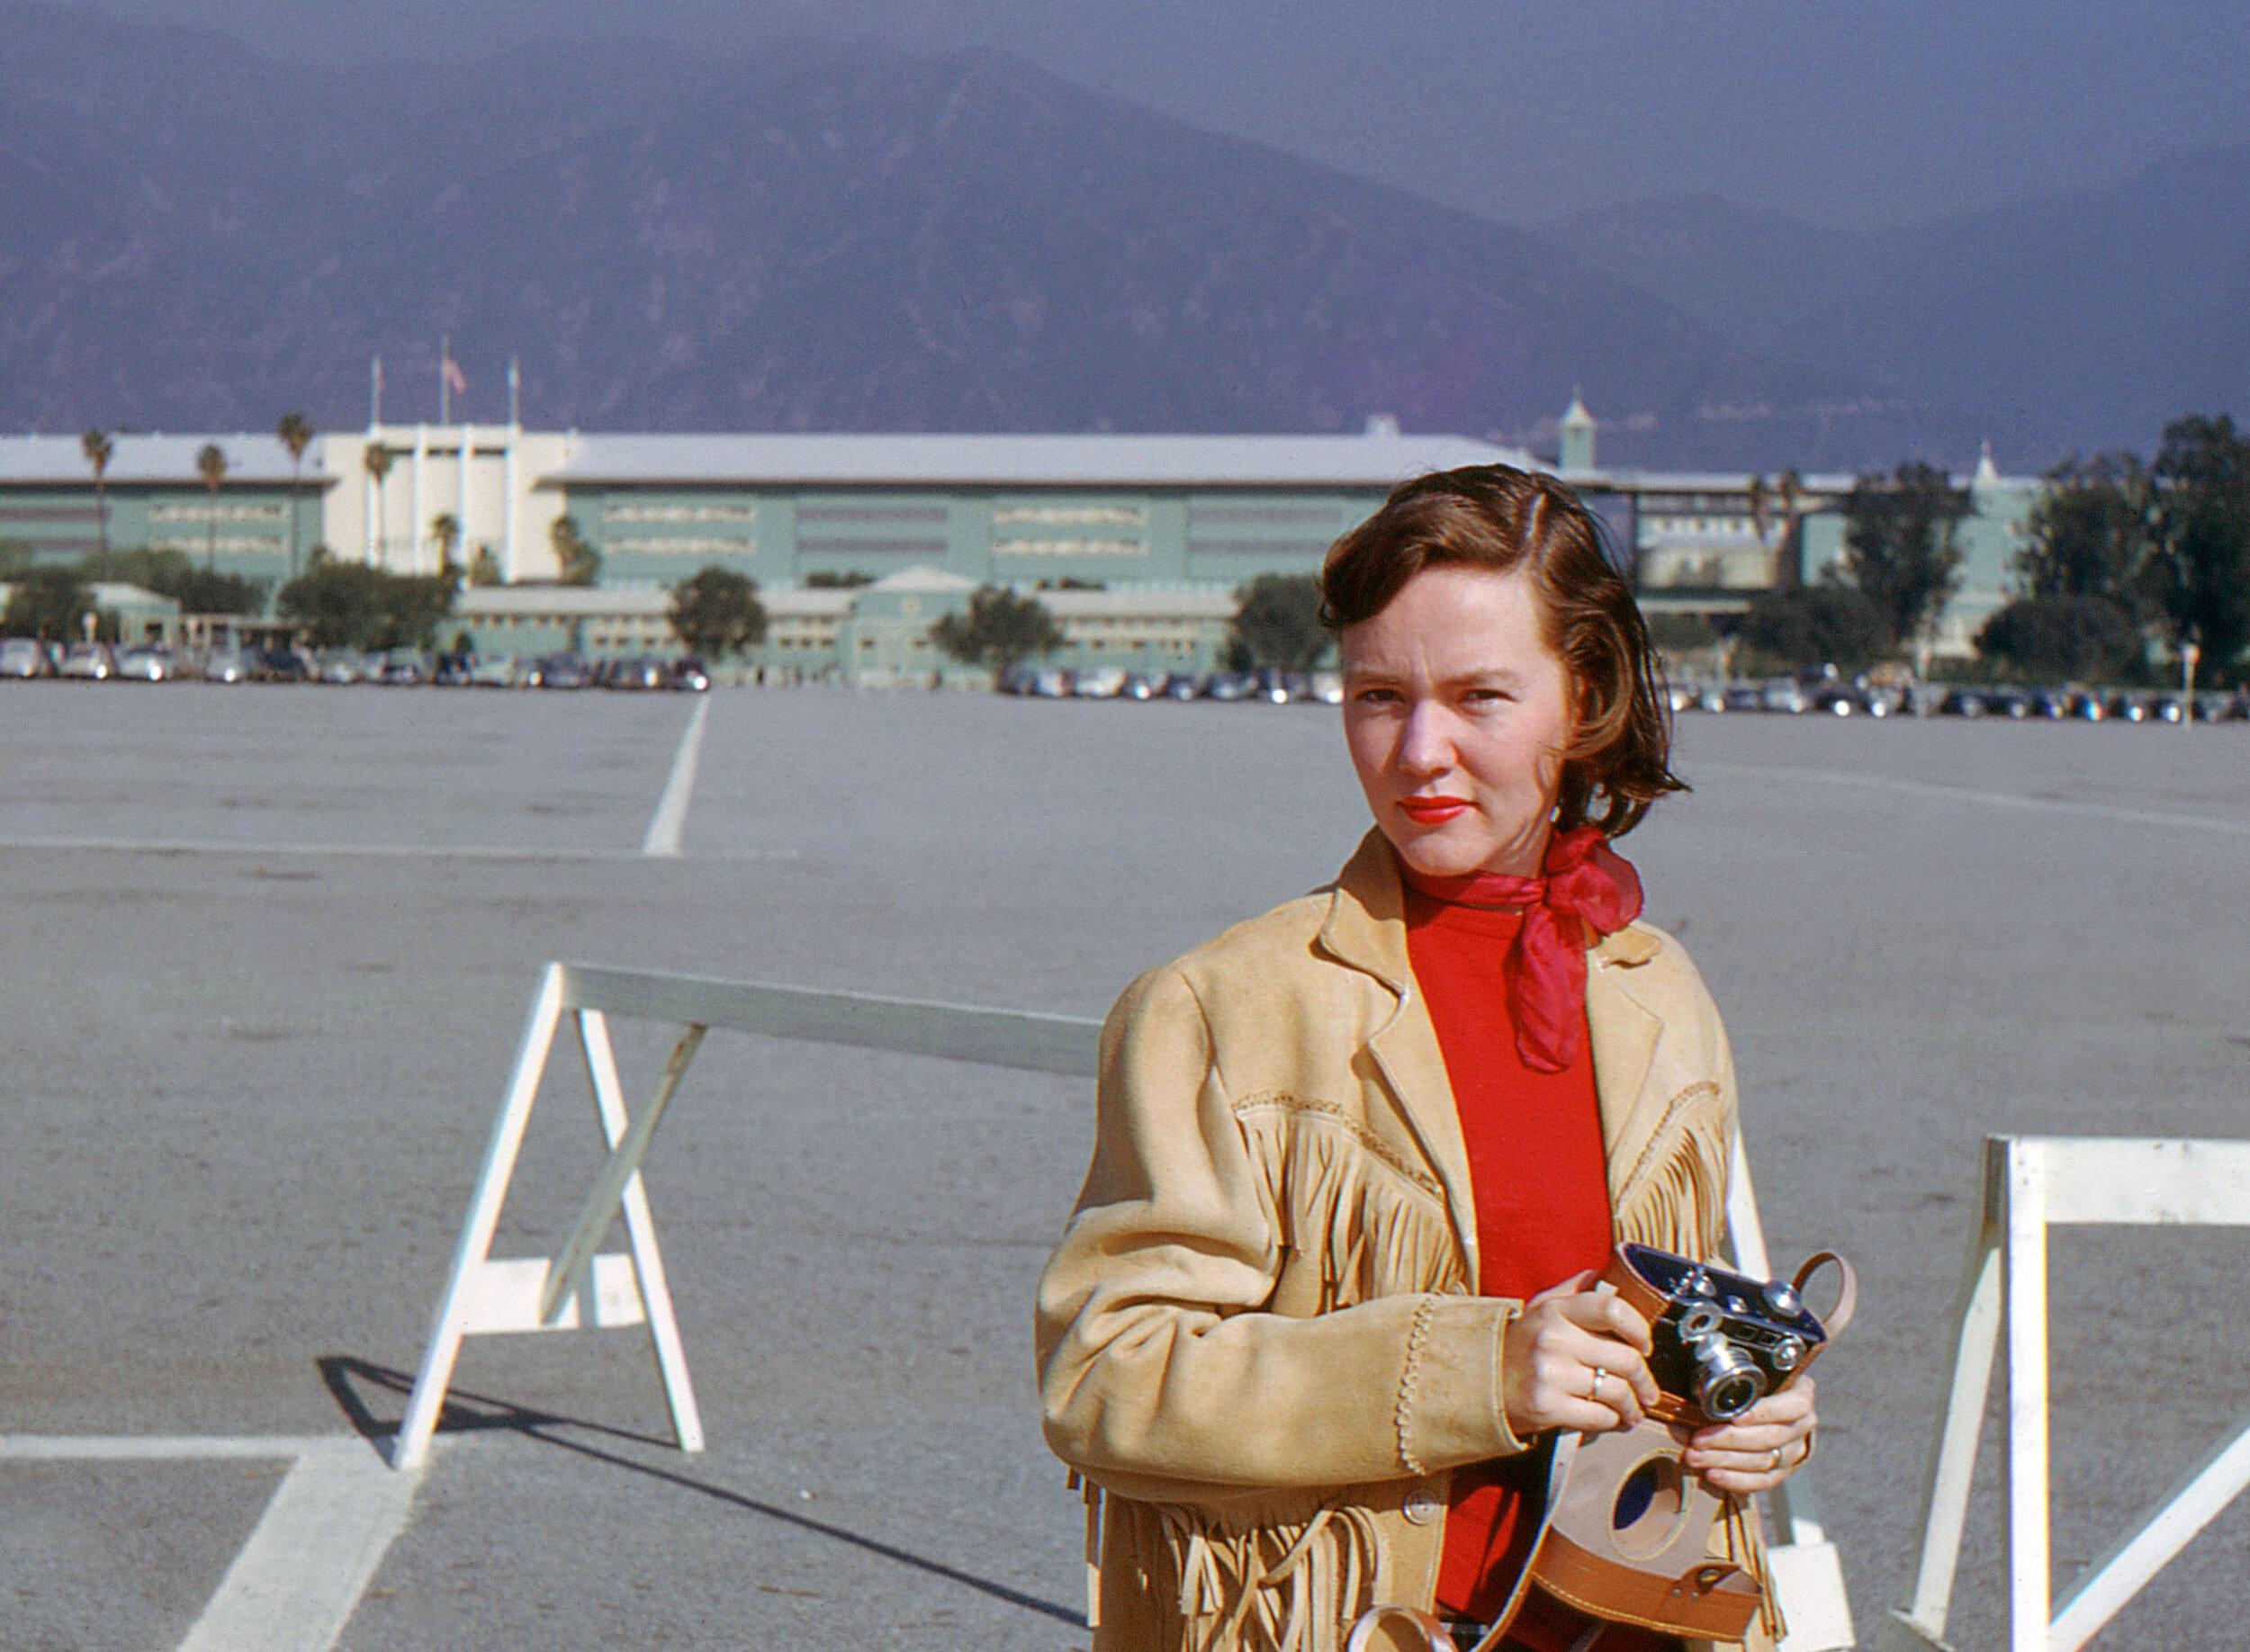 1 1940s Los Angeles racetrack California  pretty girl camera mood.jpg